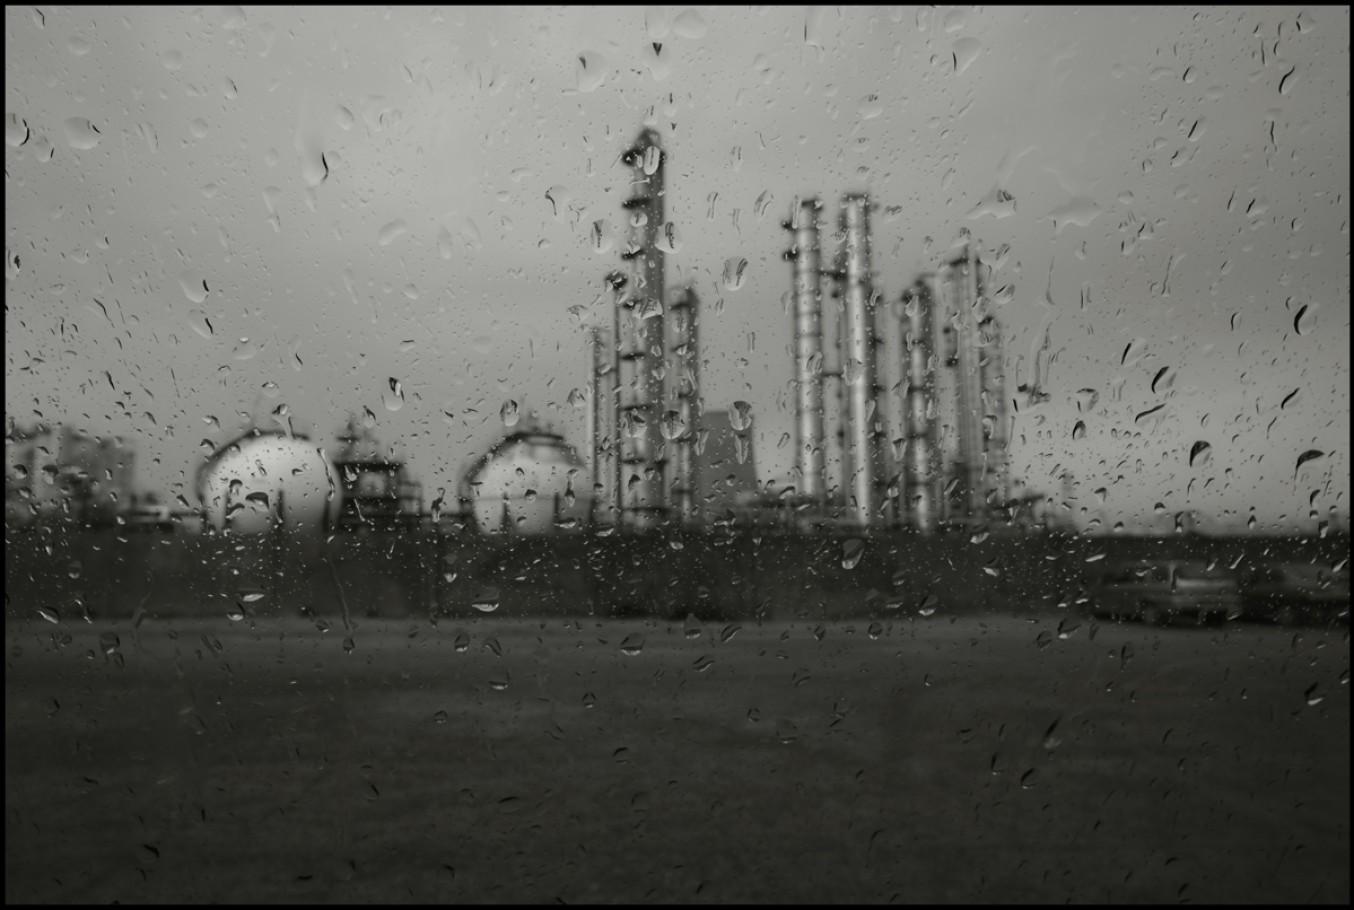 3 aprile 2006, zona industriale, stabilimento Enichem